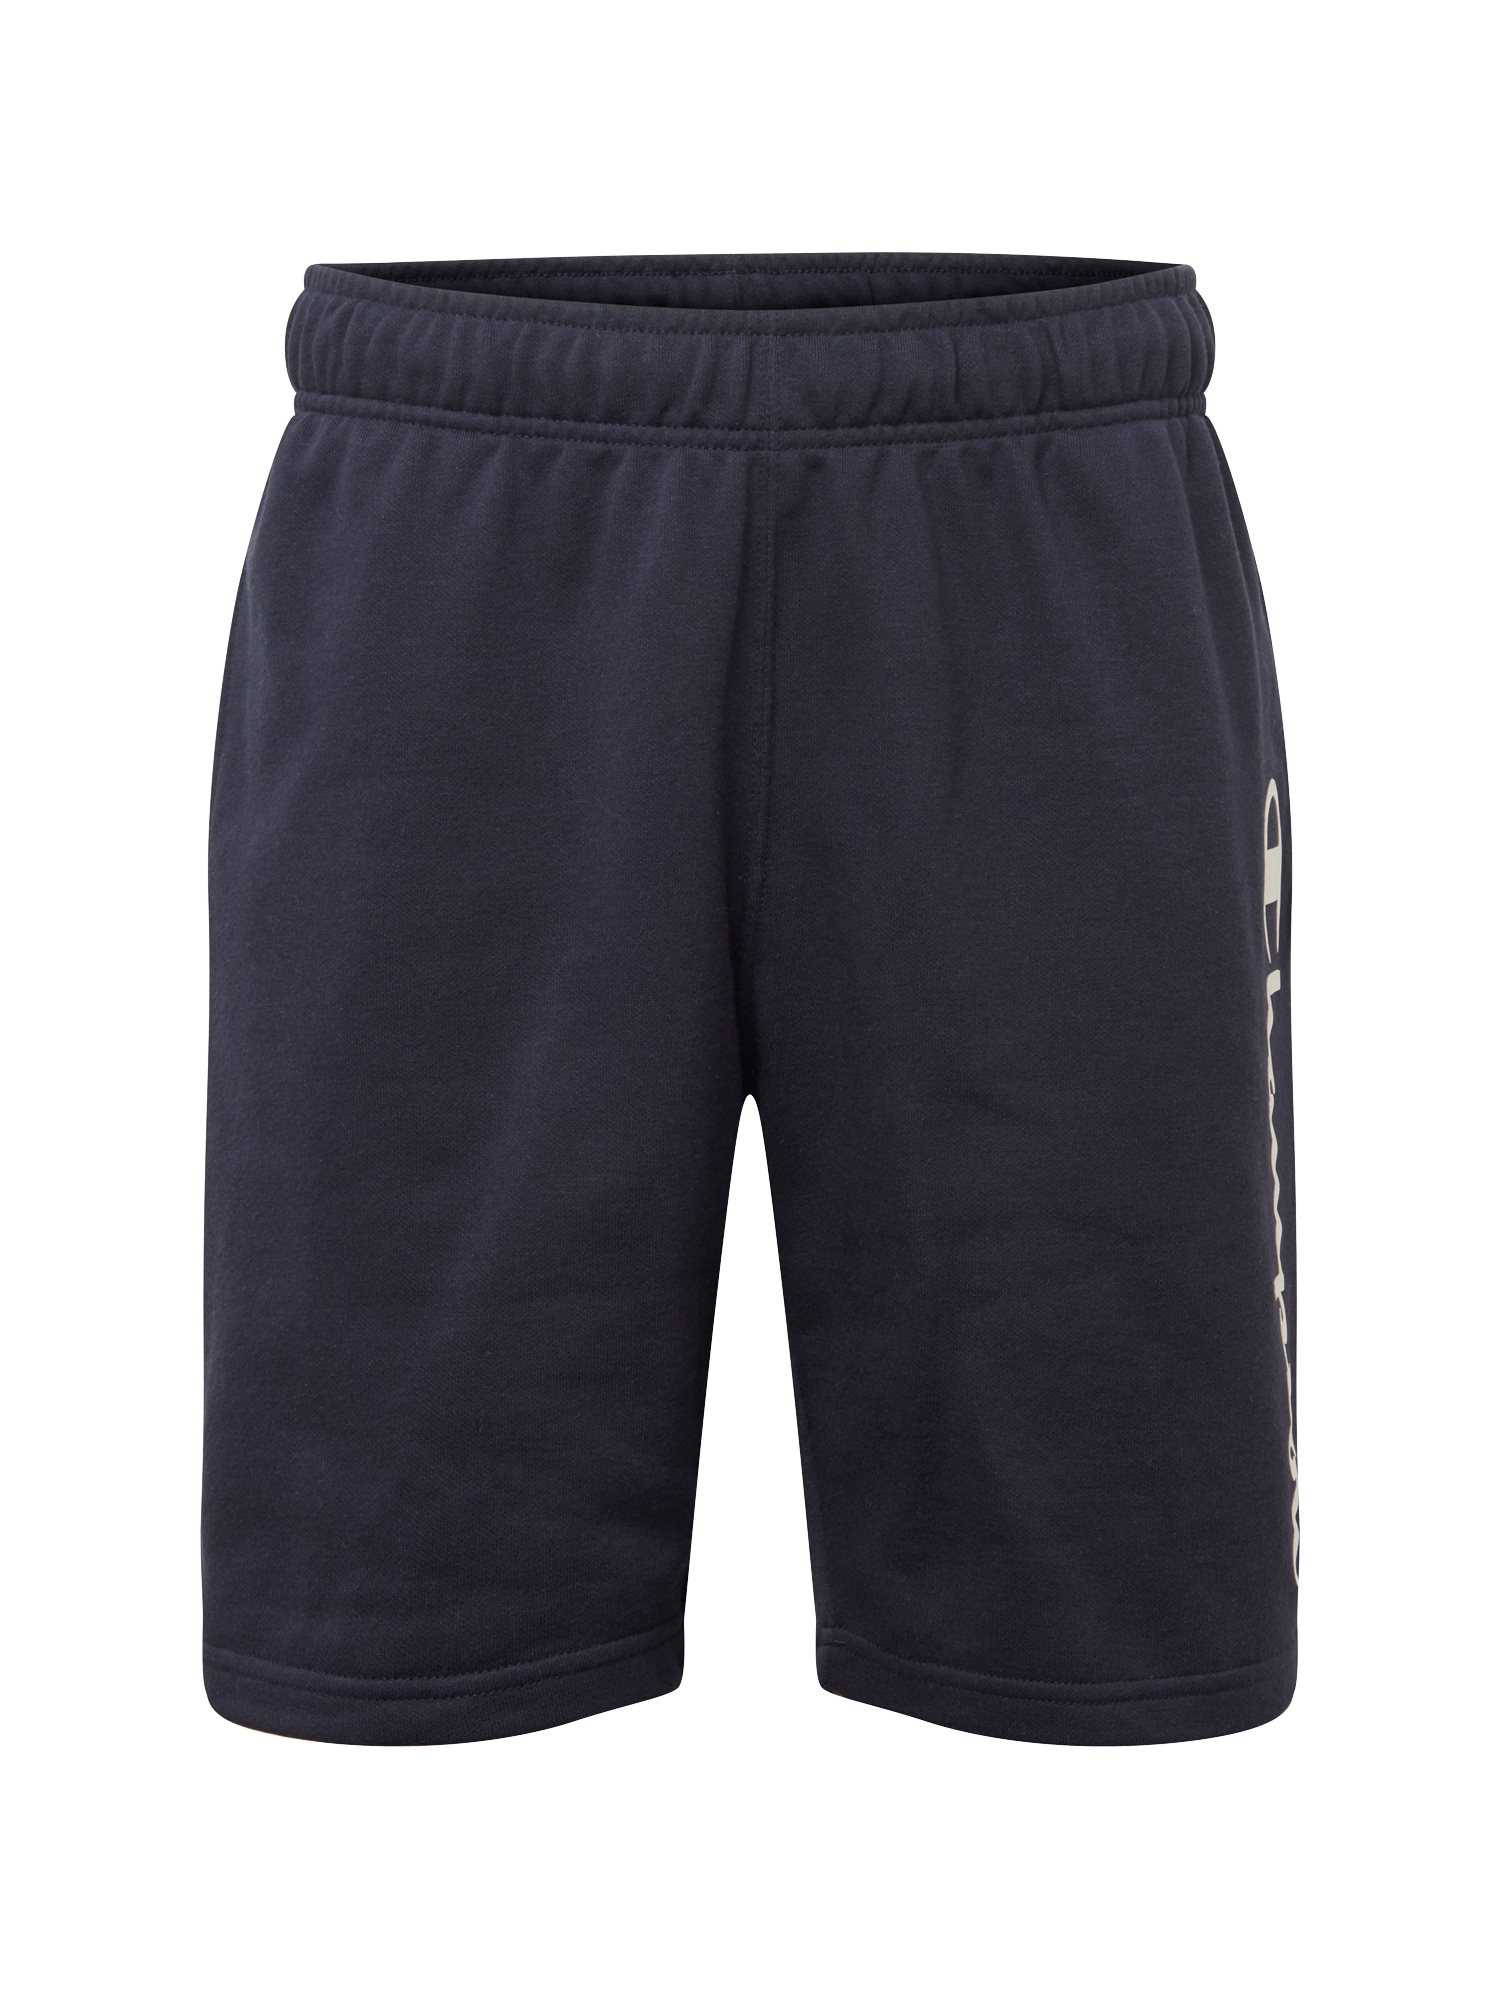 Kalhoty Bermuda tmavě modrá bílá Champion Authentic Athletic Apparel